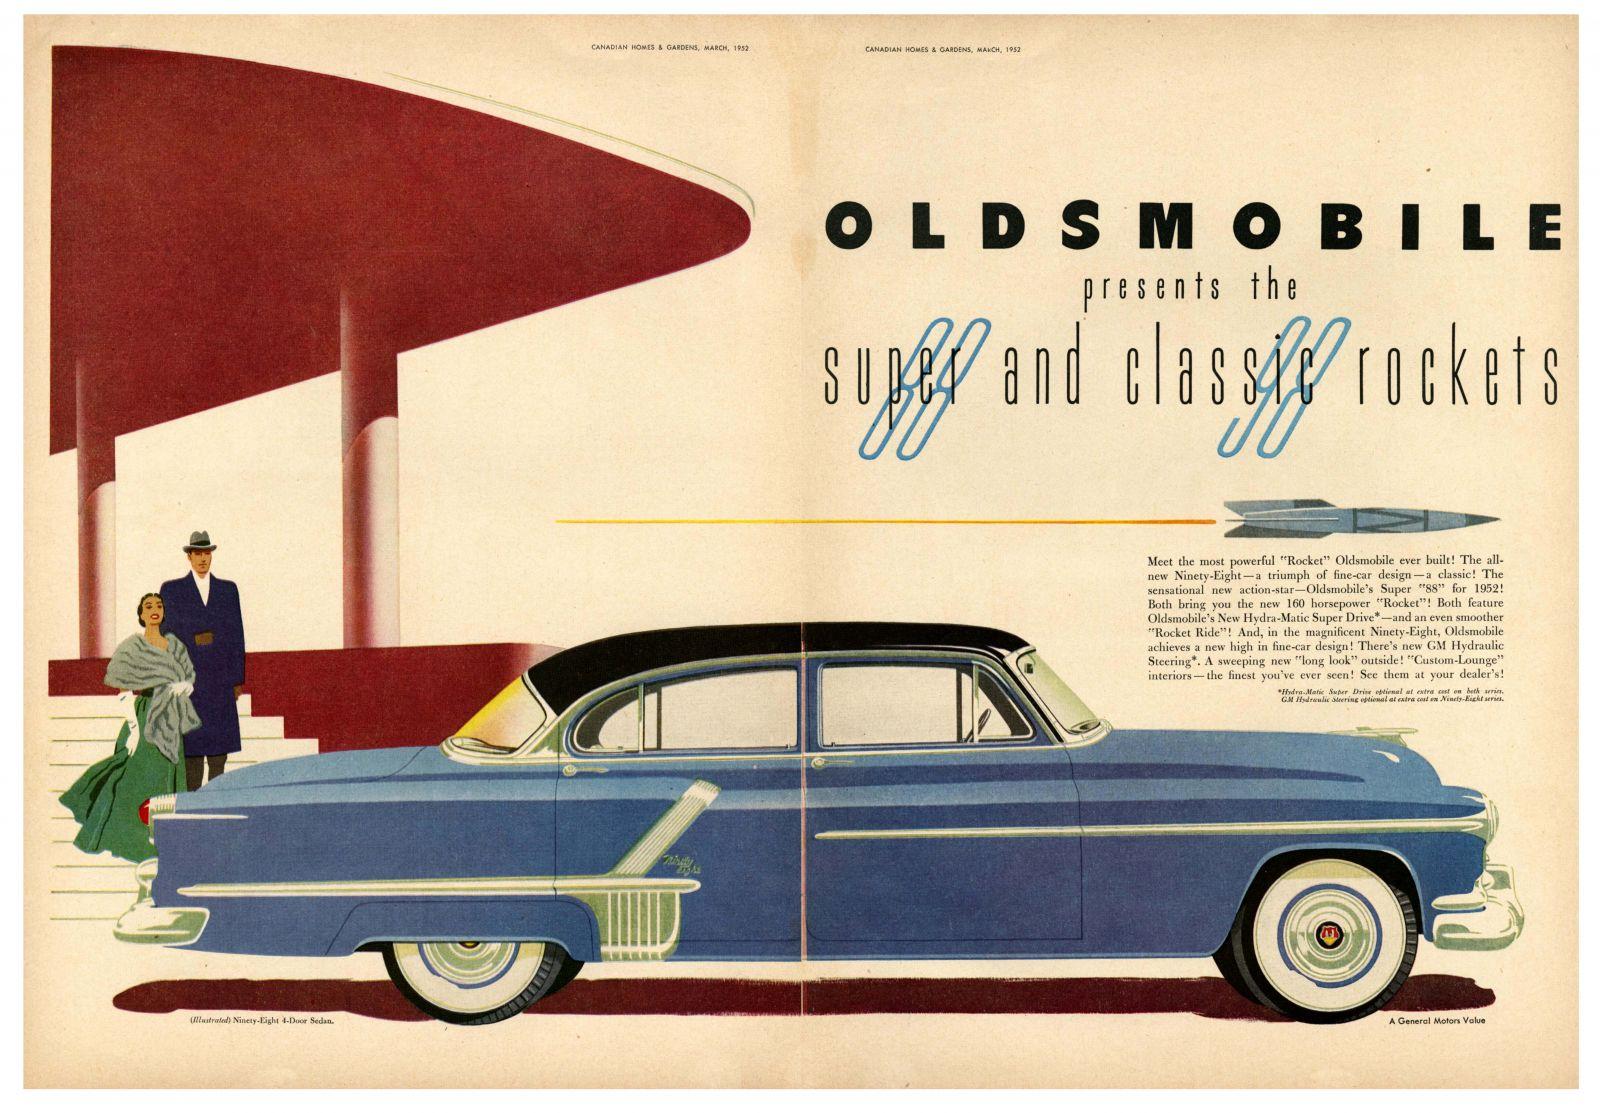 Super & Classic Rockets, Oldsmobile, 1952